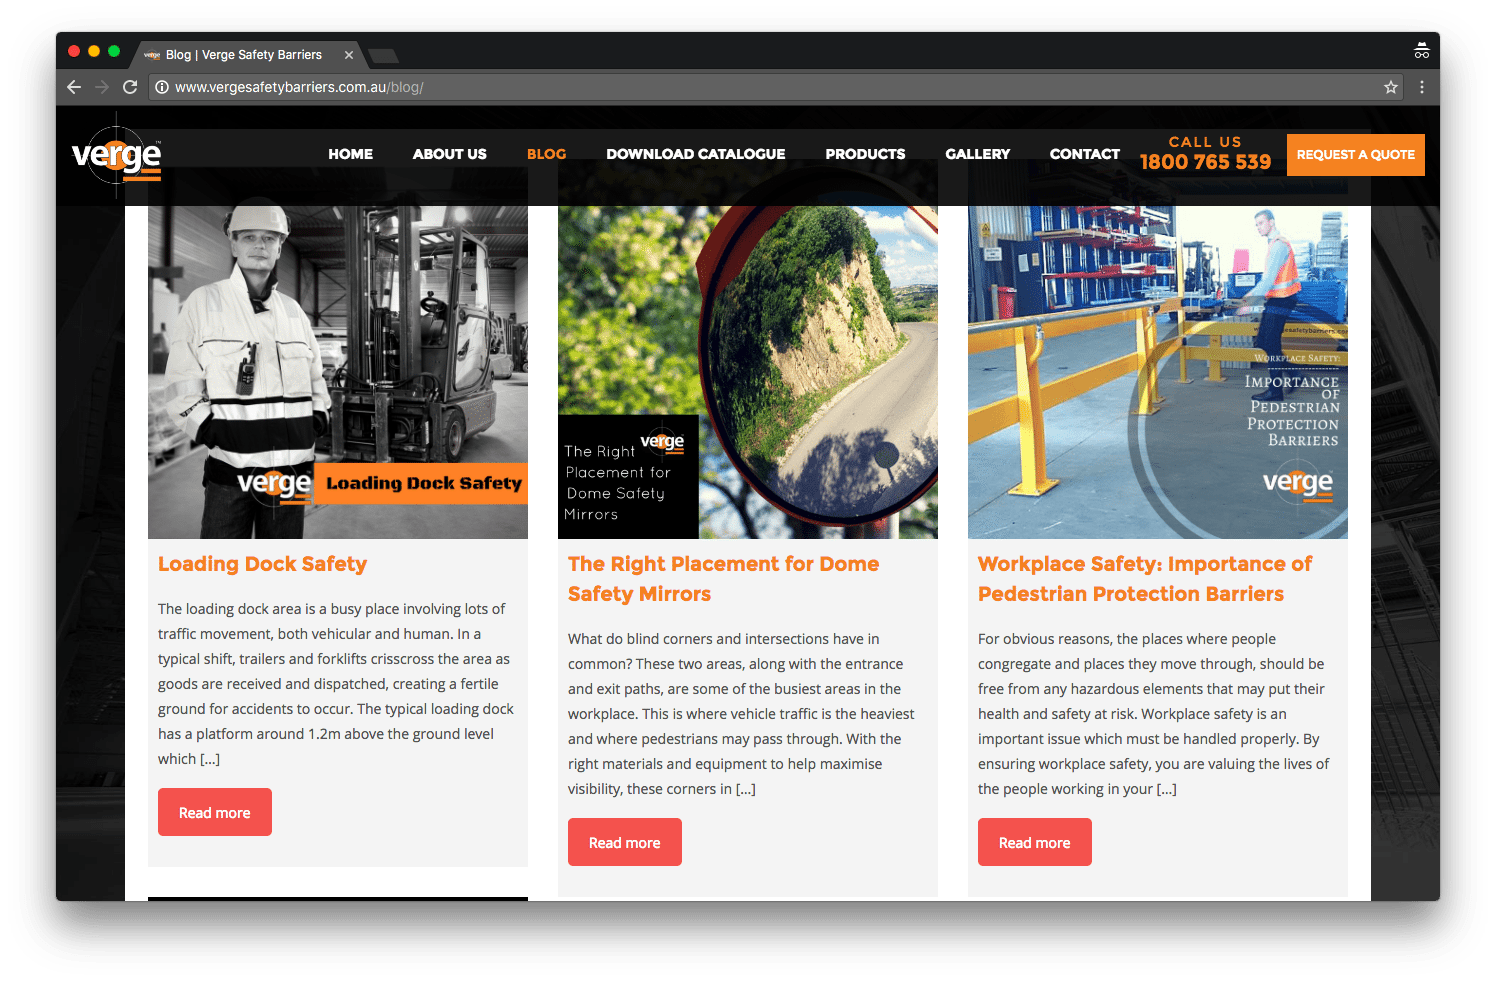 verge-safety-barriers-blog